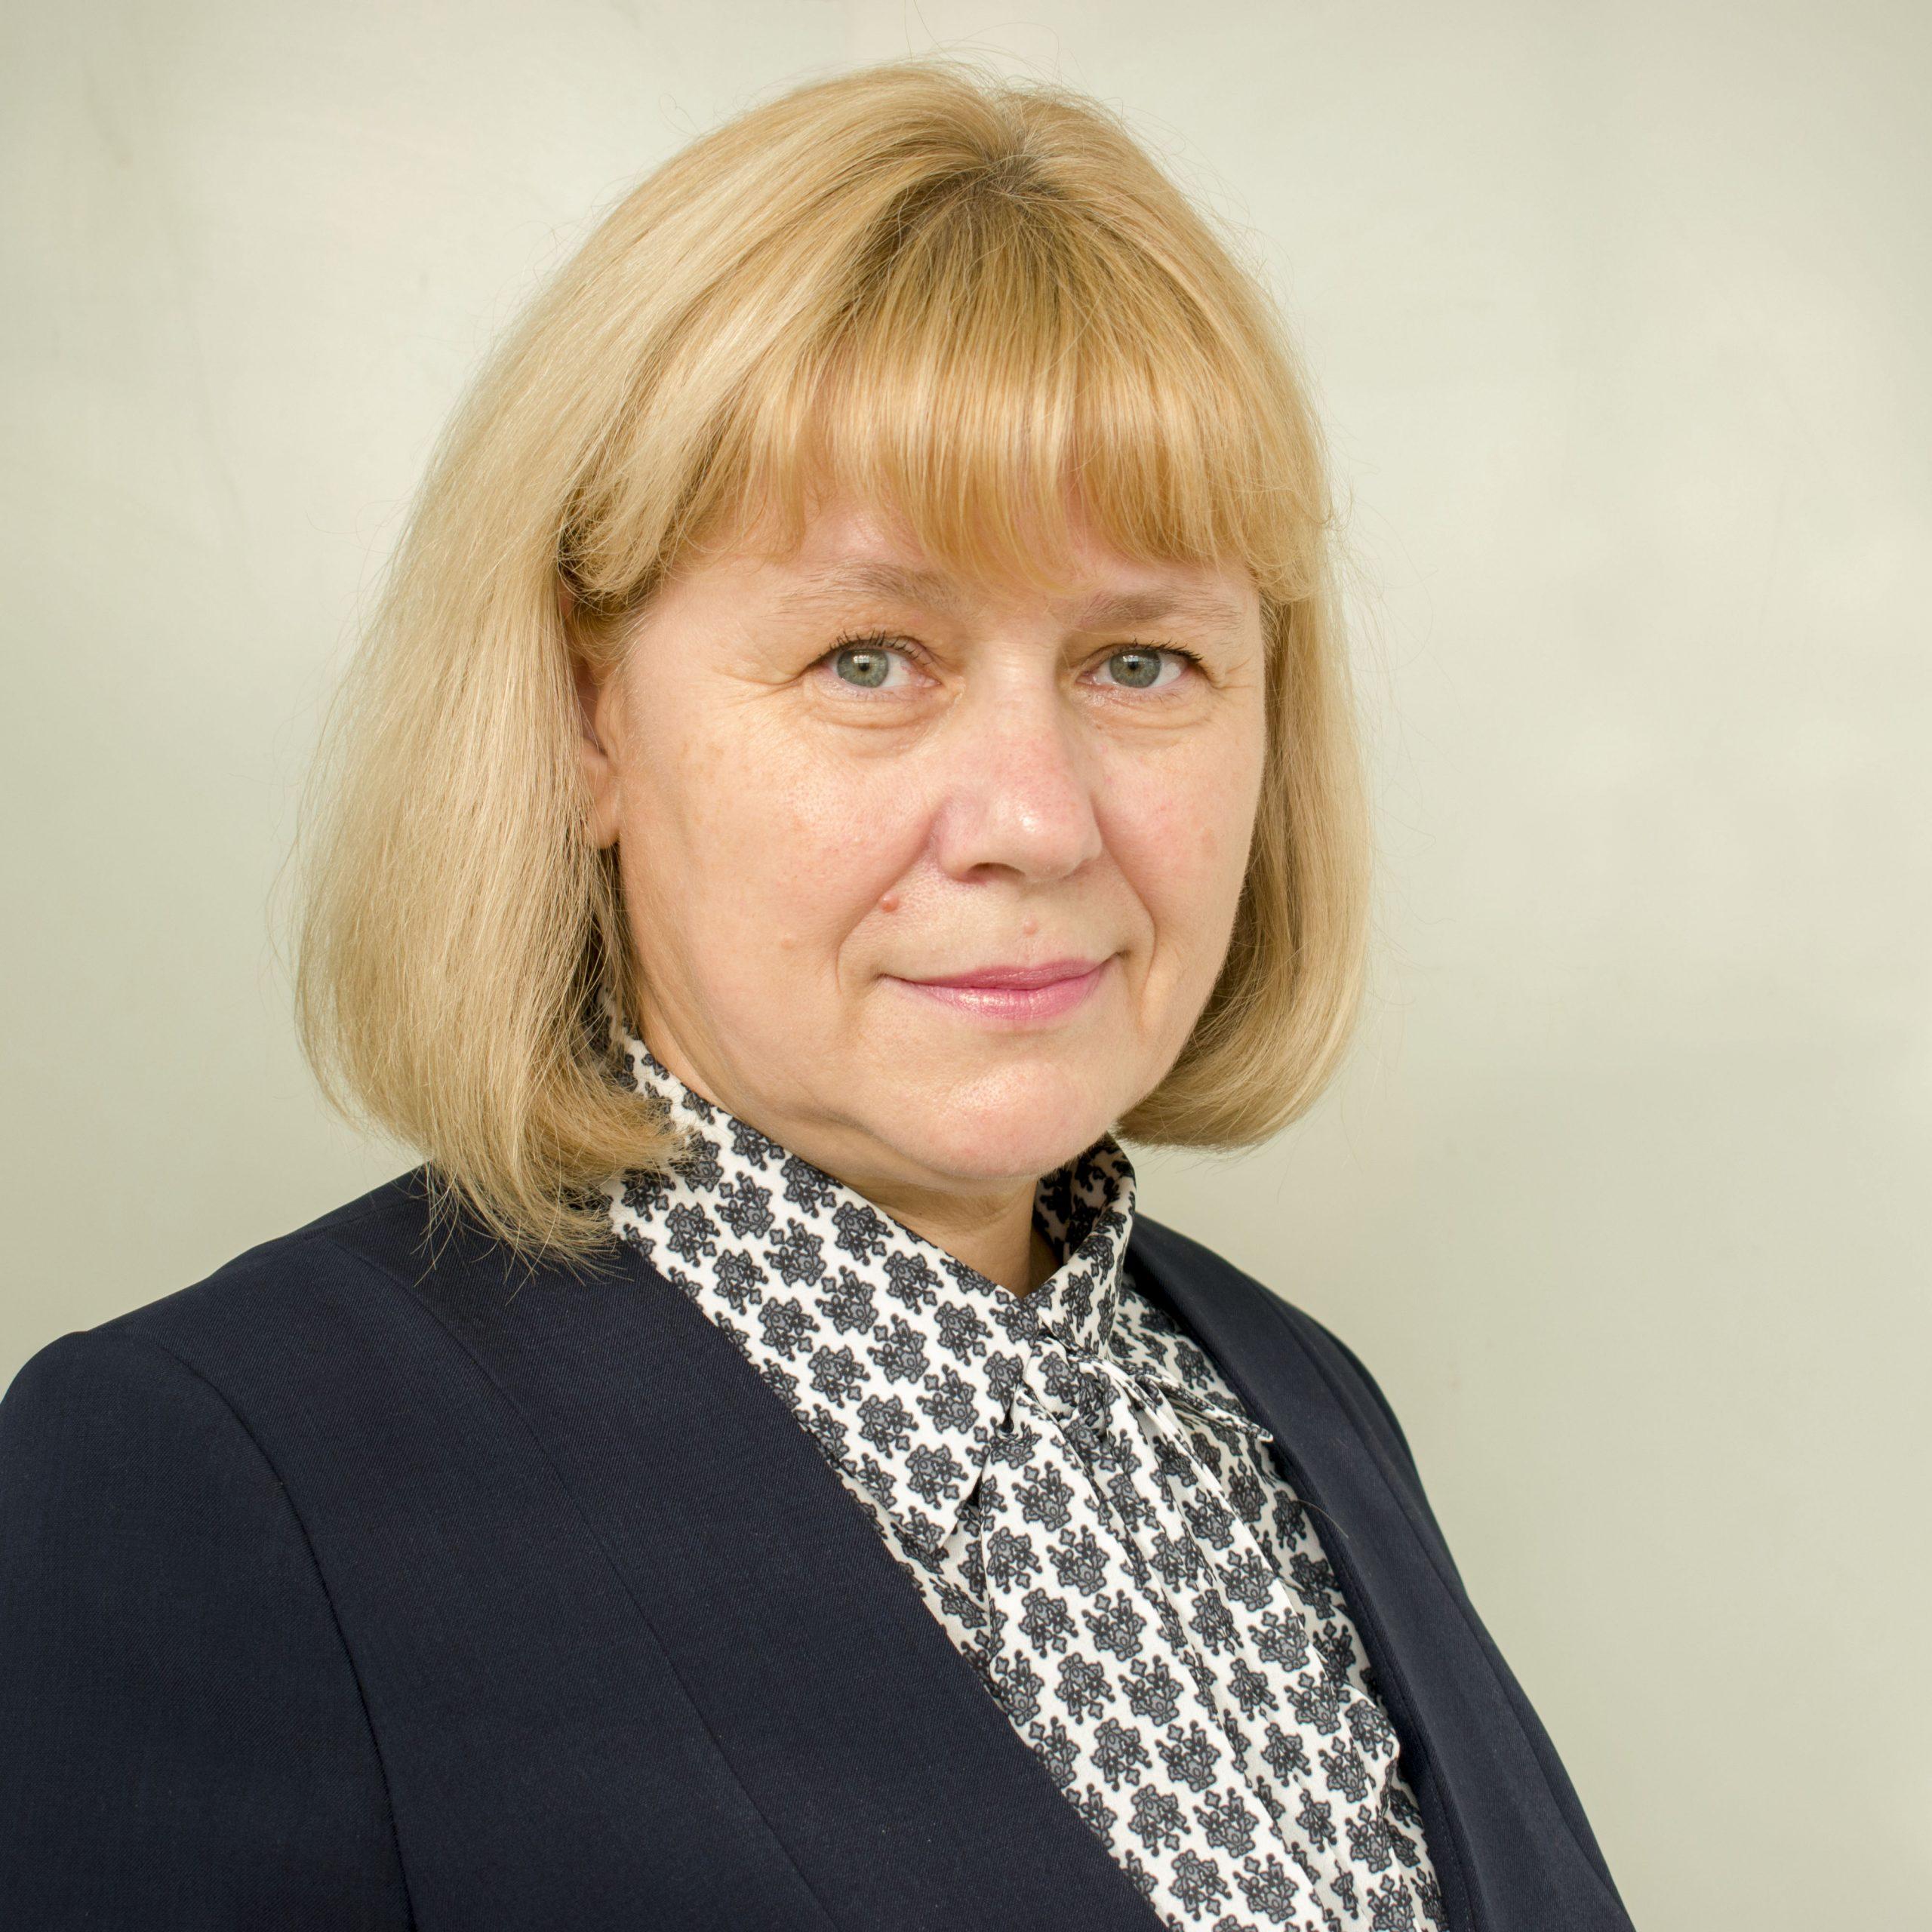 Marina Pustovit